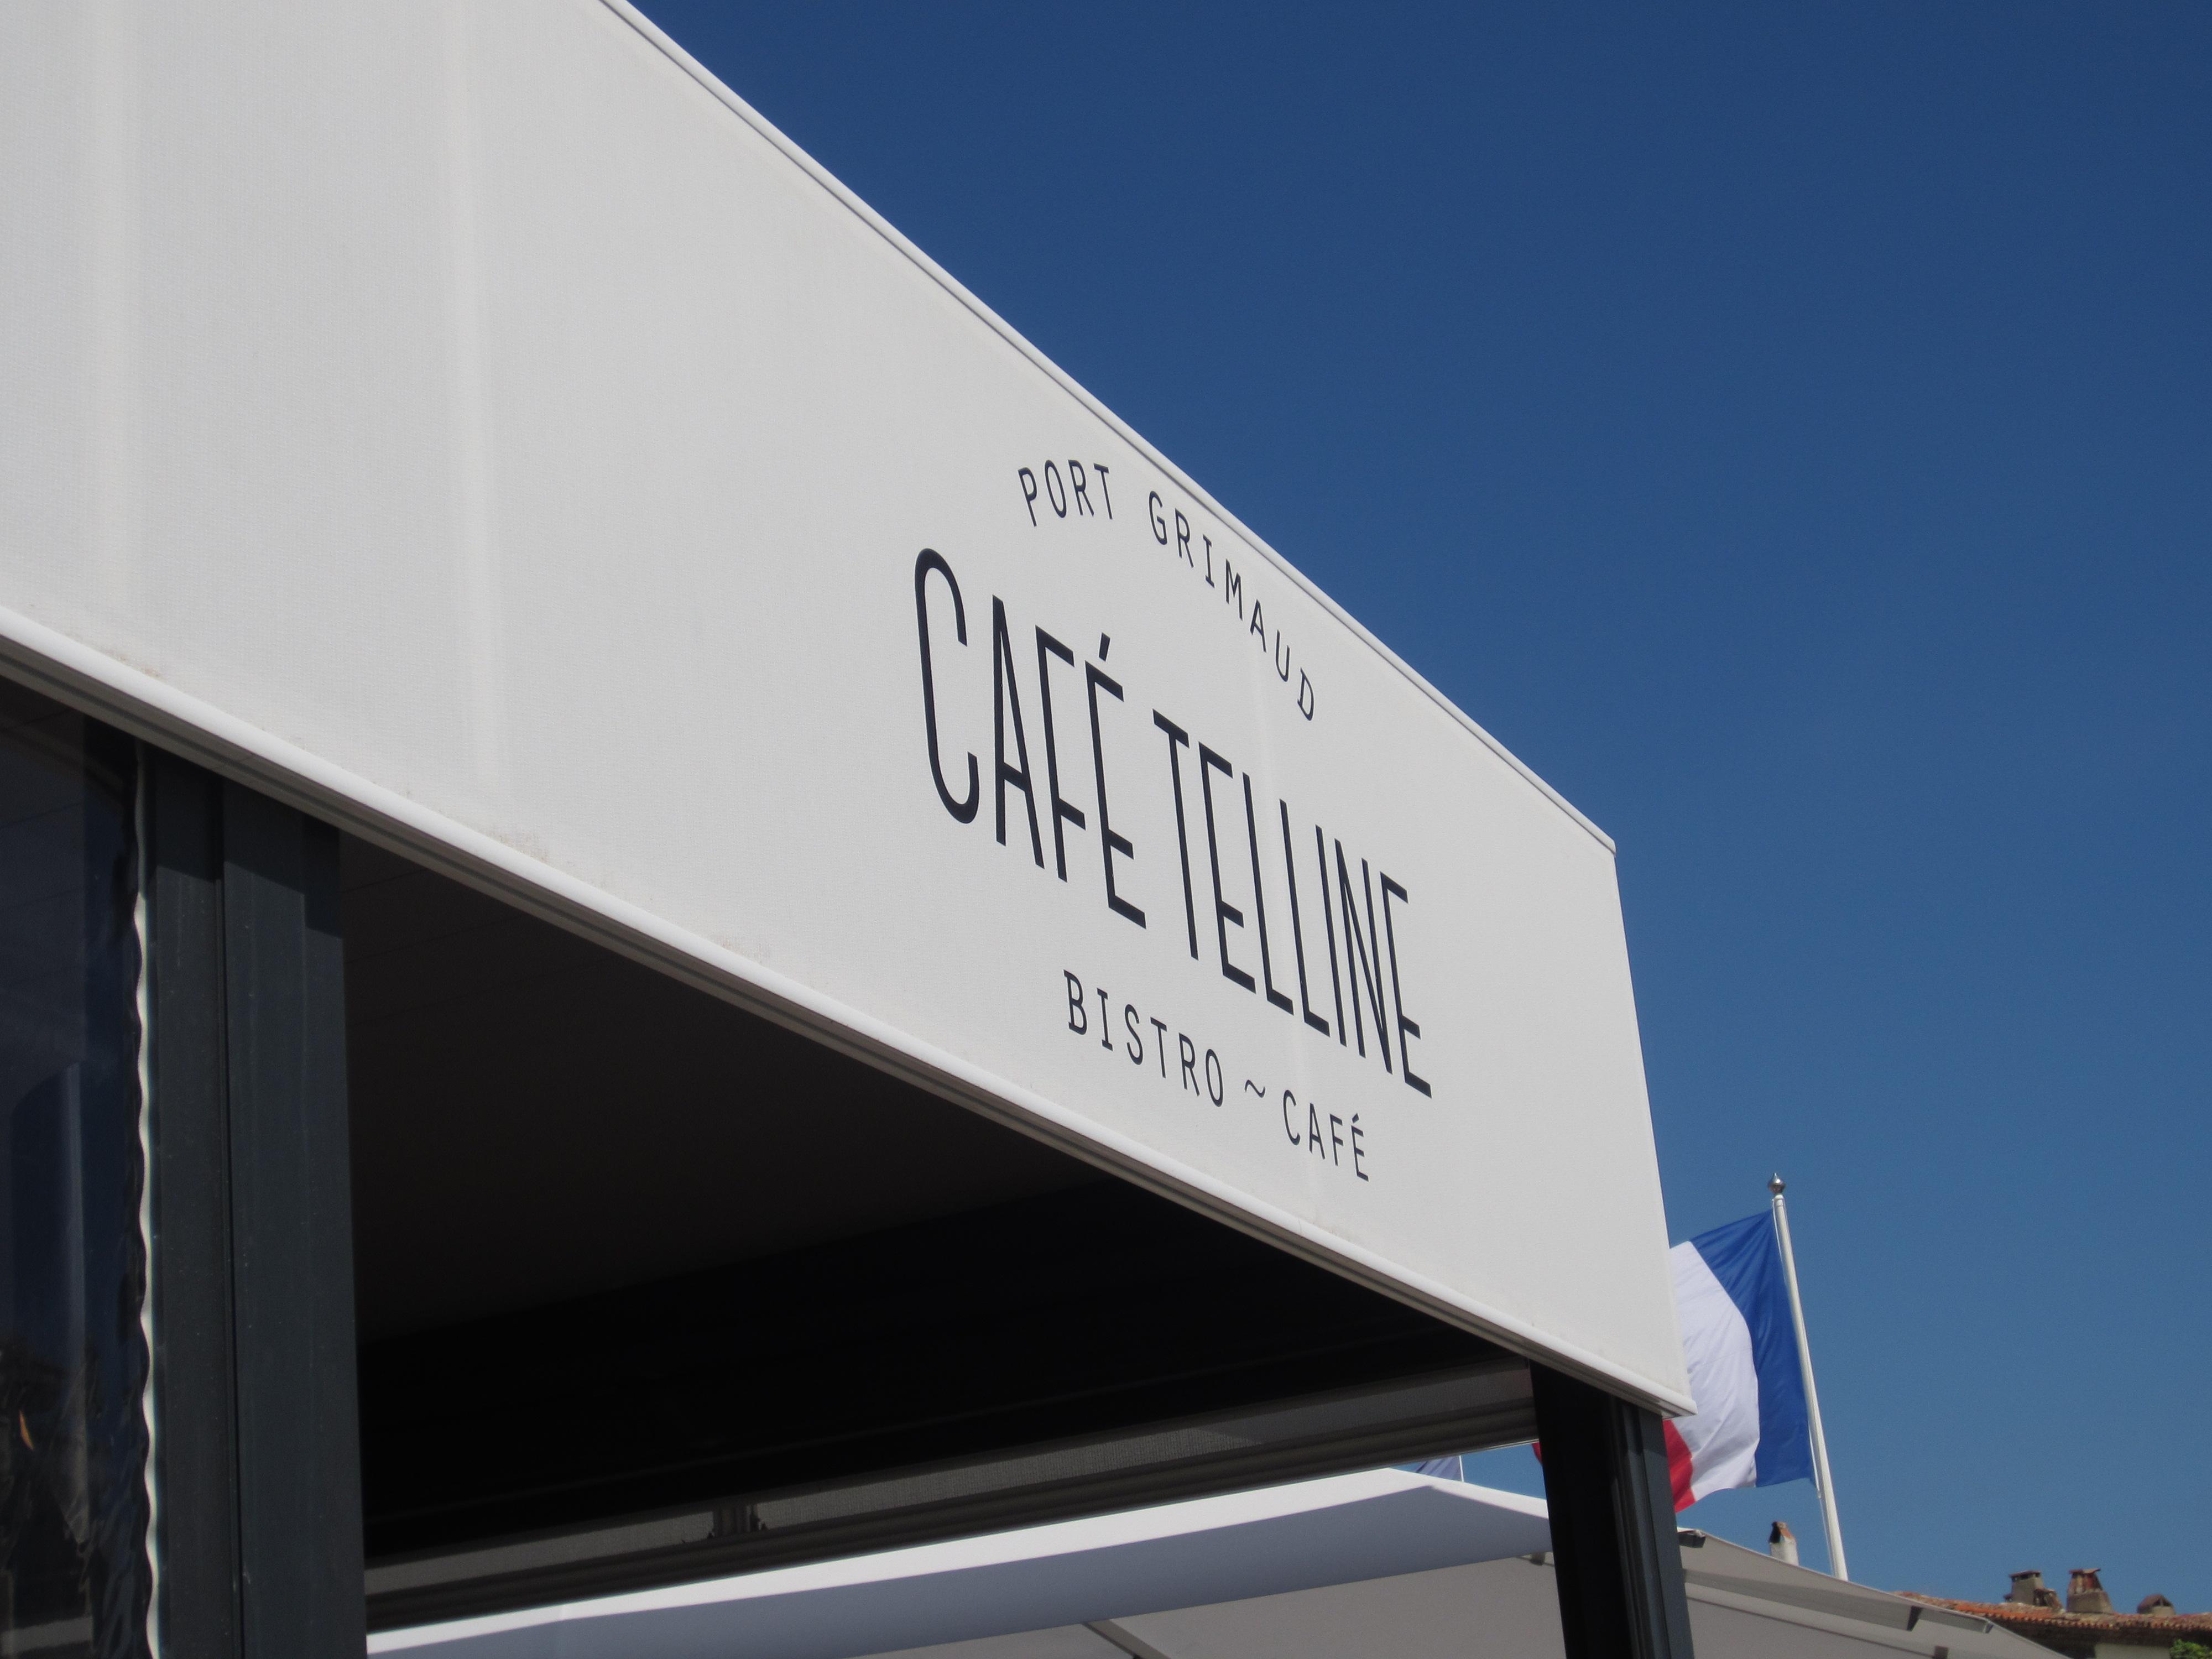 Café-Telline-Port-Grimaud-5